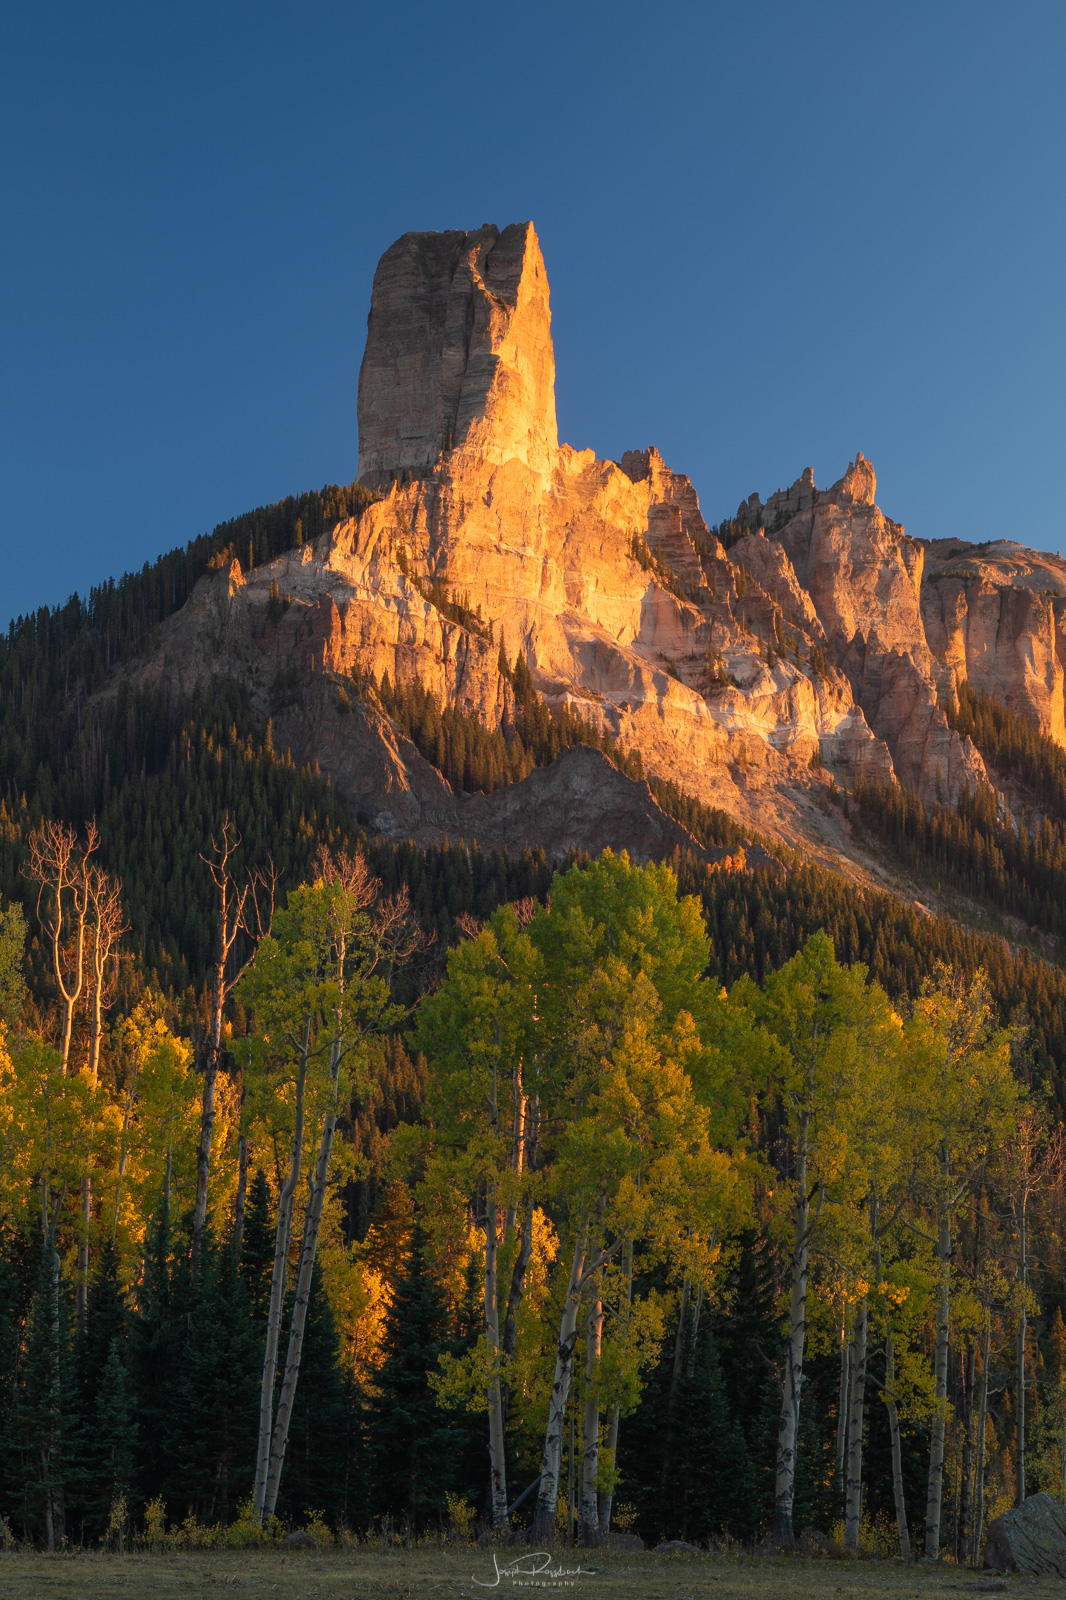 Last light strikes courthouse Mountain at sunset.